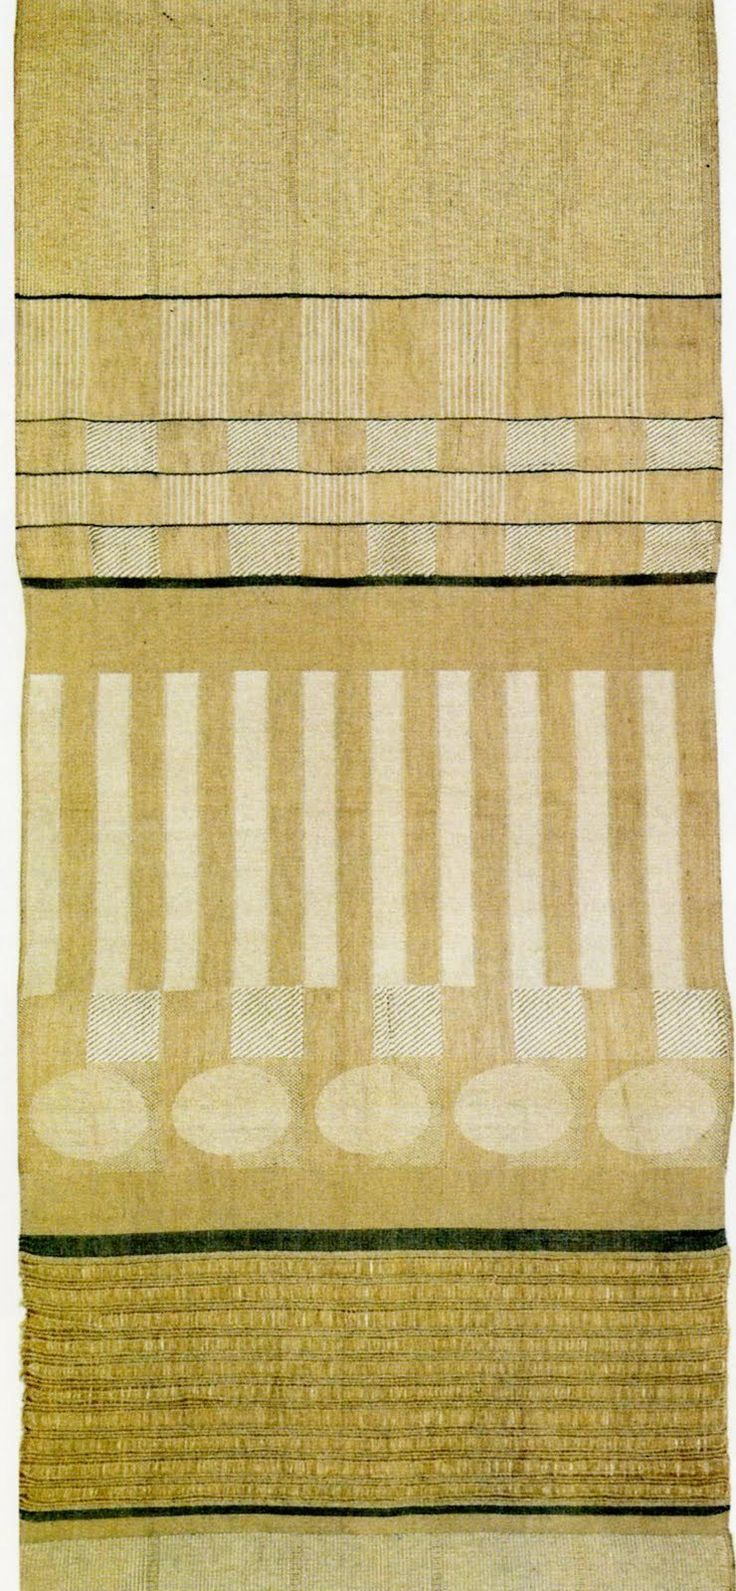 Gunta Solzl http://kathykavan.posthaven.com/the-bauhaus-textiles-of-gunta-stolzl-anni-alb